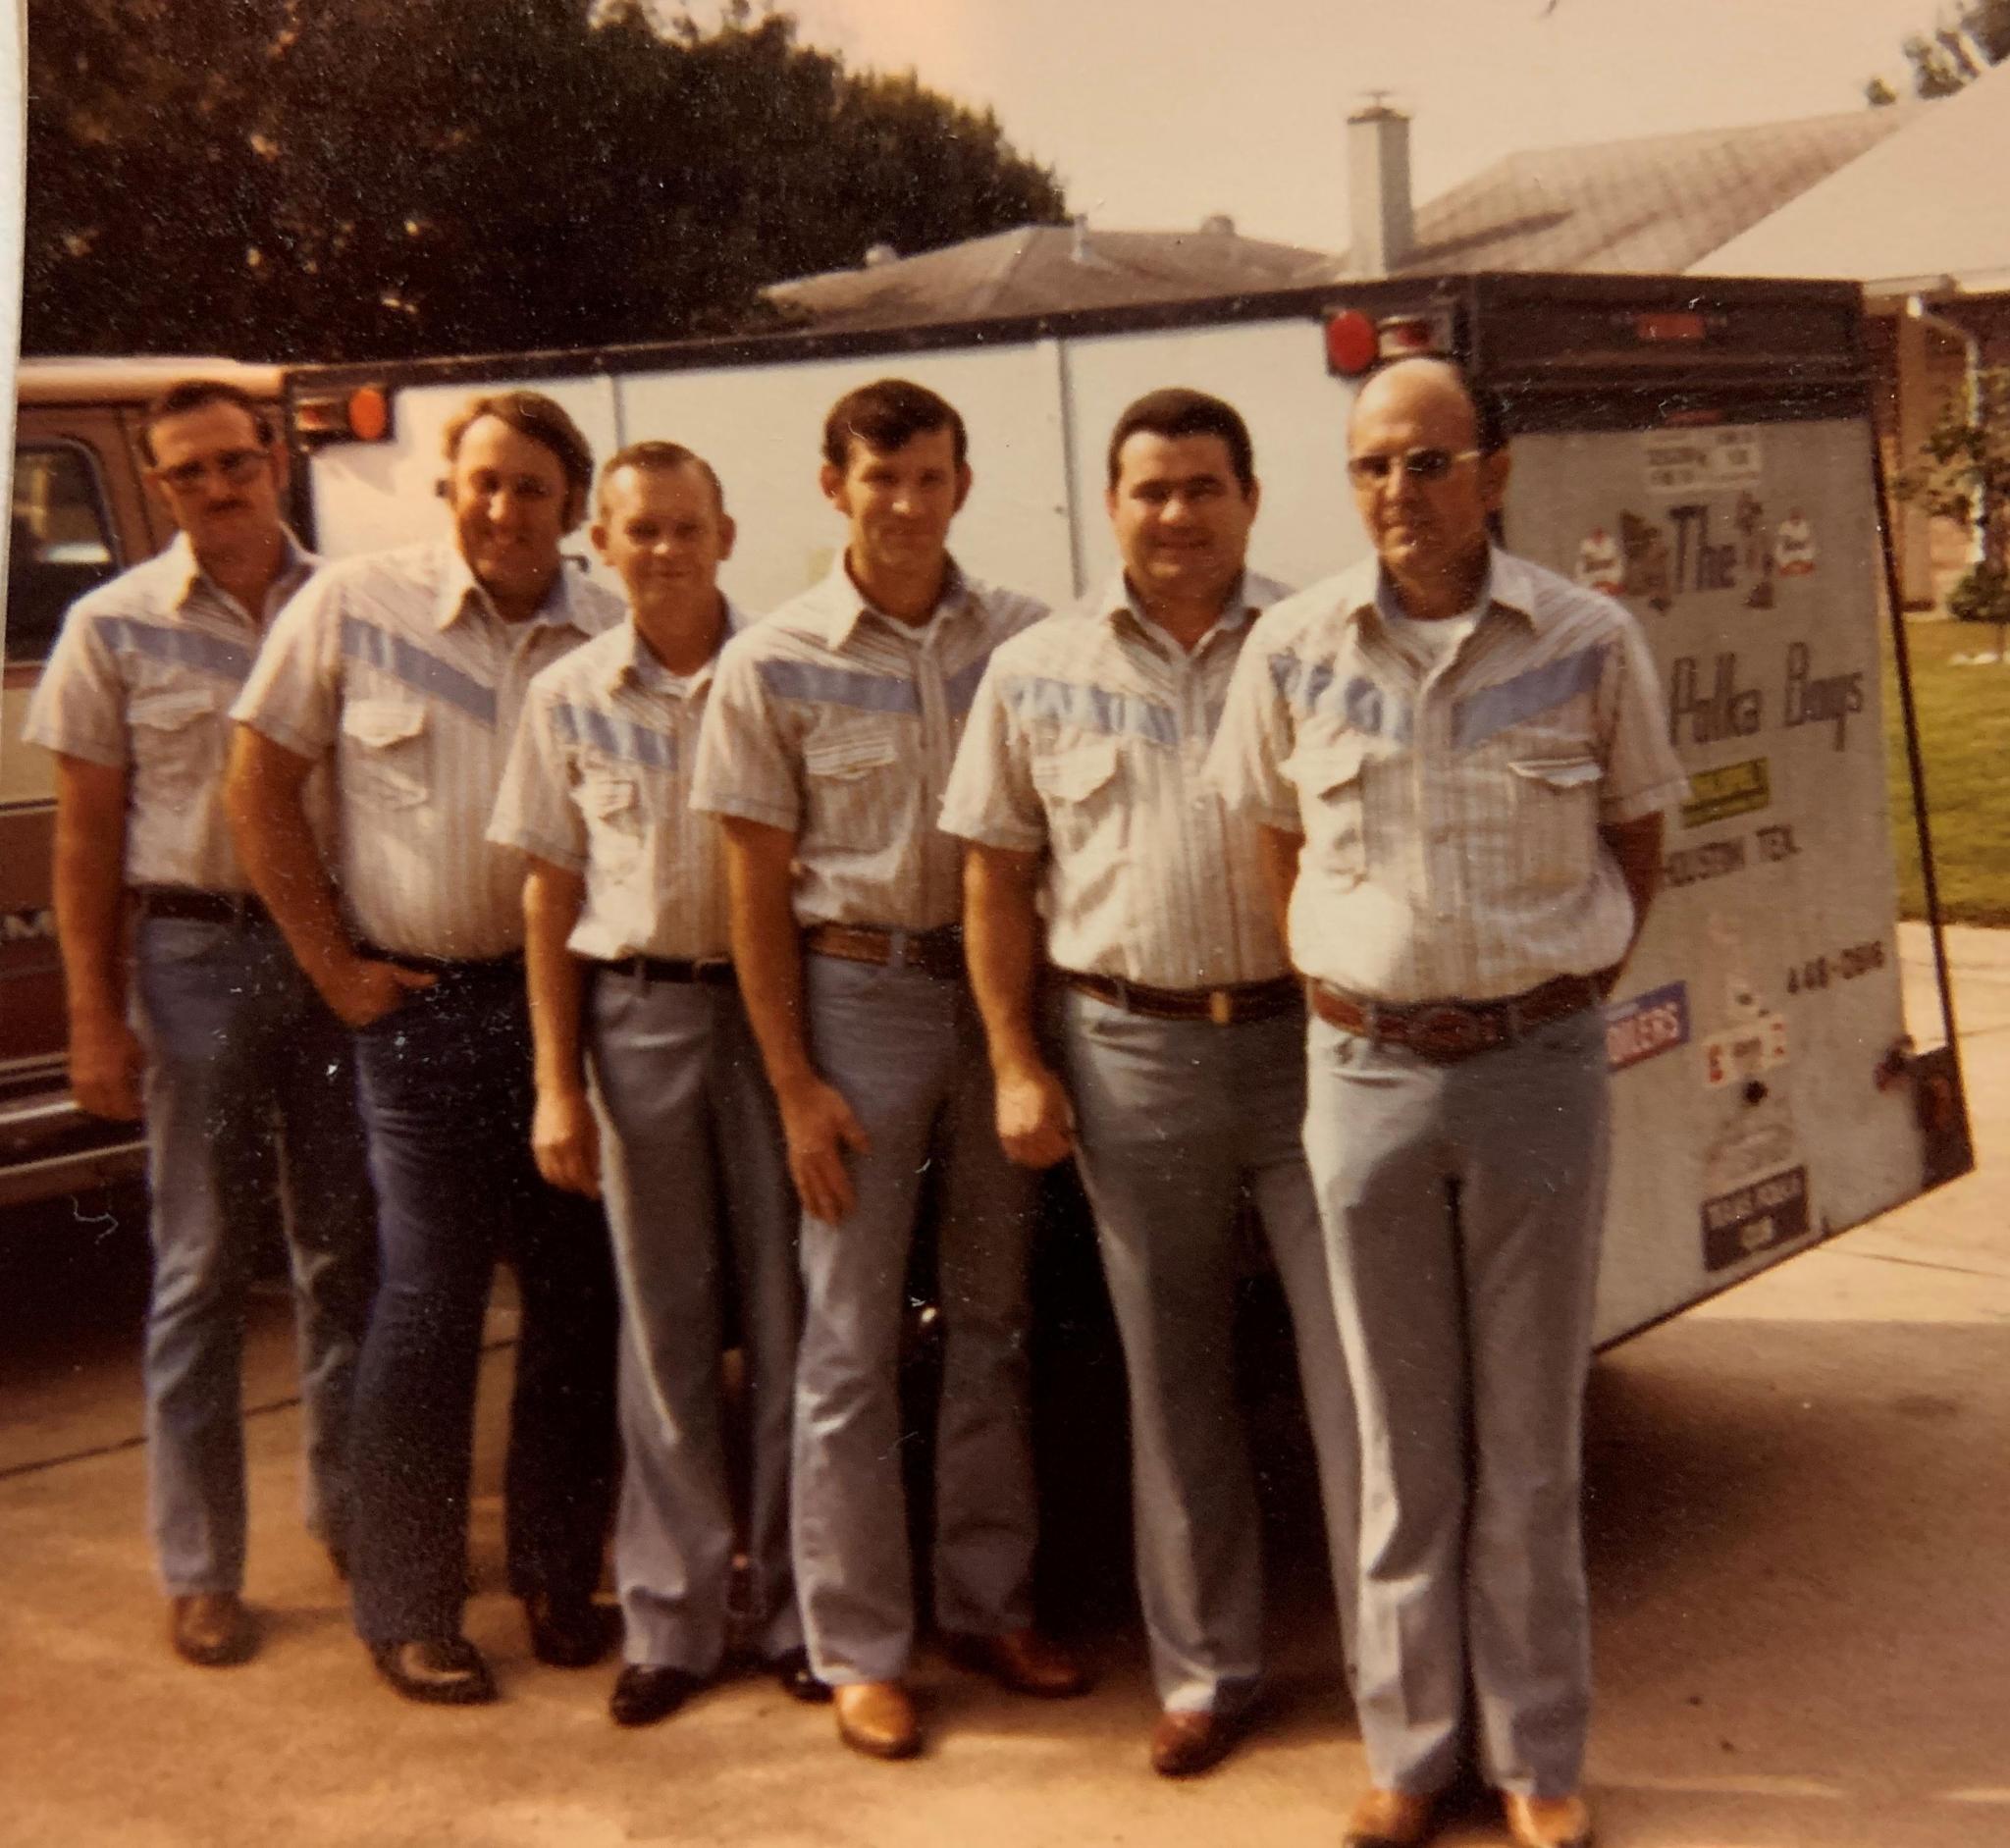 City Polka Boys Harry Macik, Hubert Janak, Benny Okruhlik, Wes Matus, James Ohnheiser, E. J. Macik - 1976